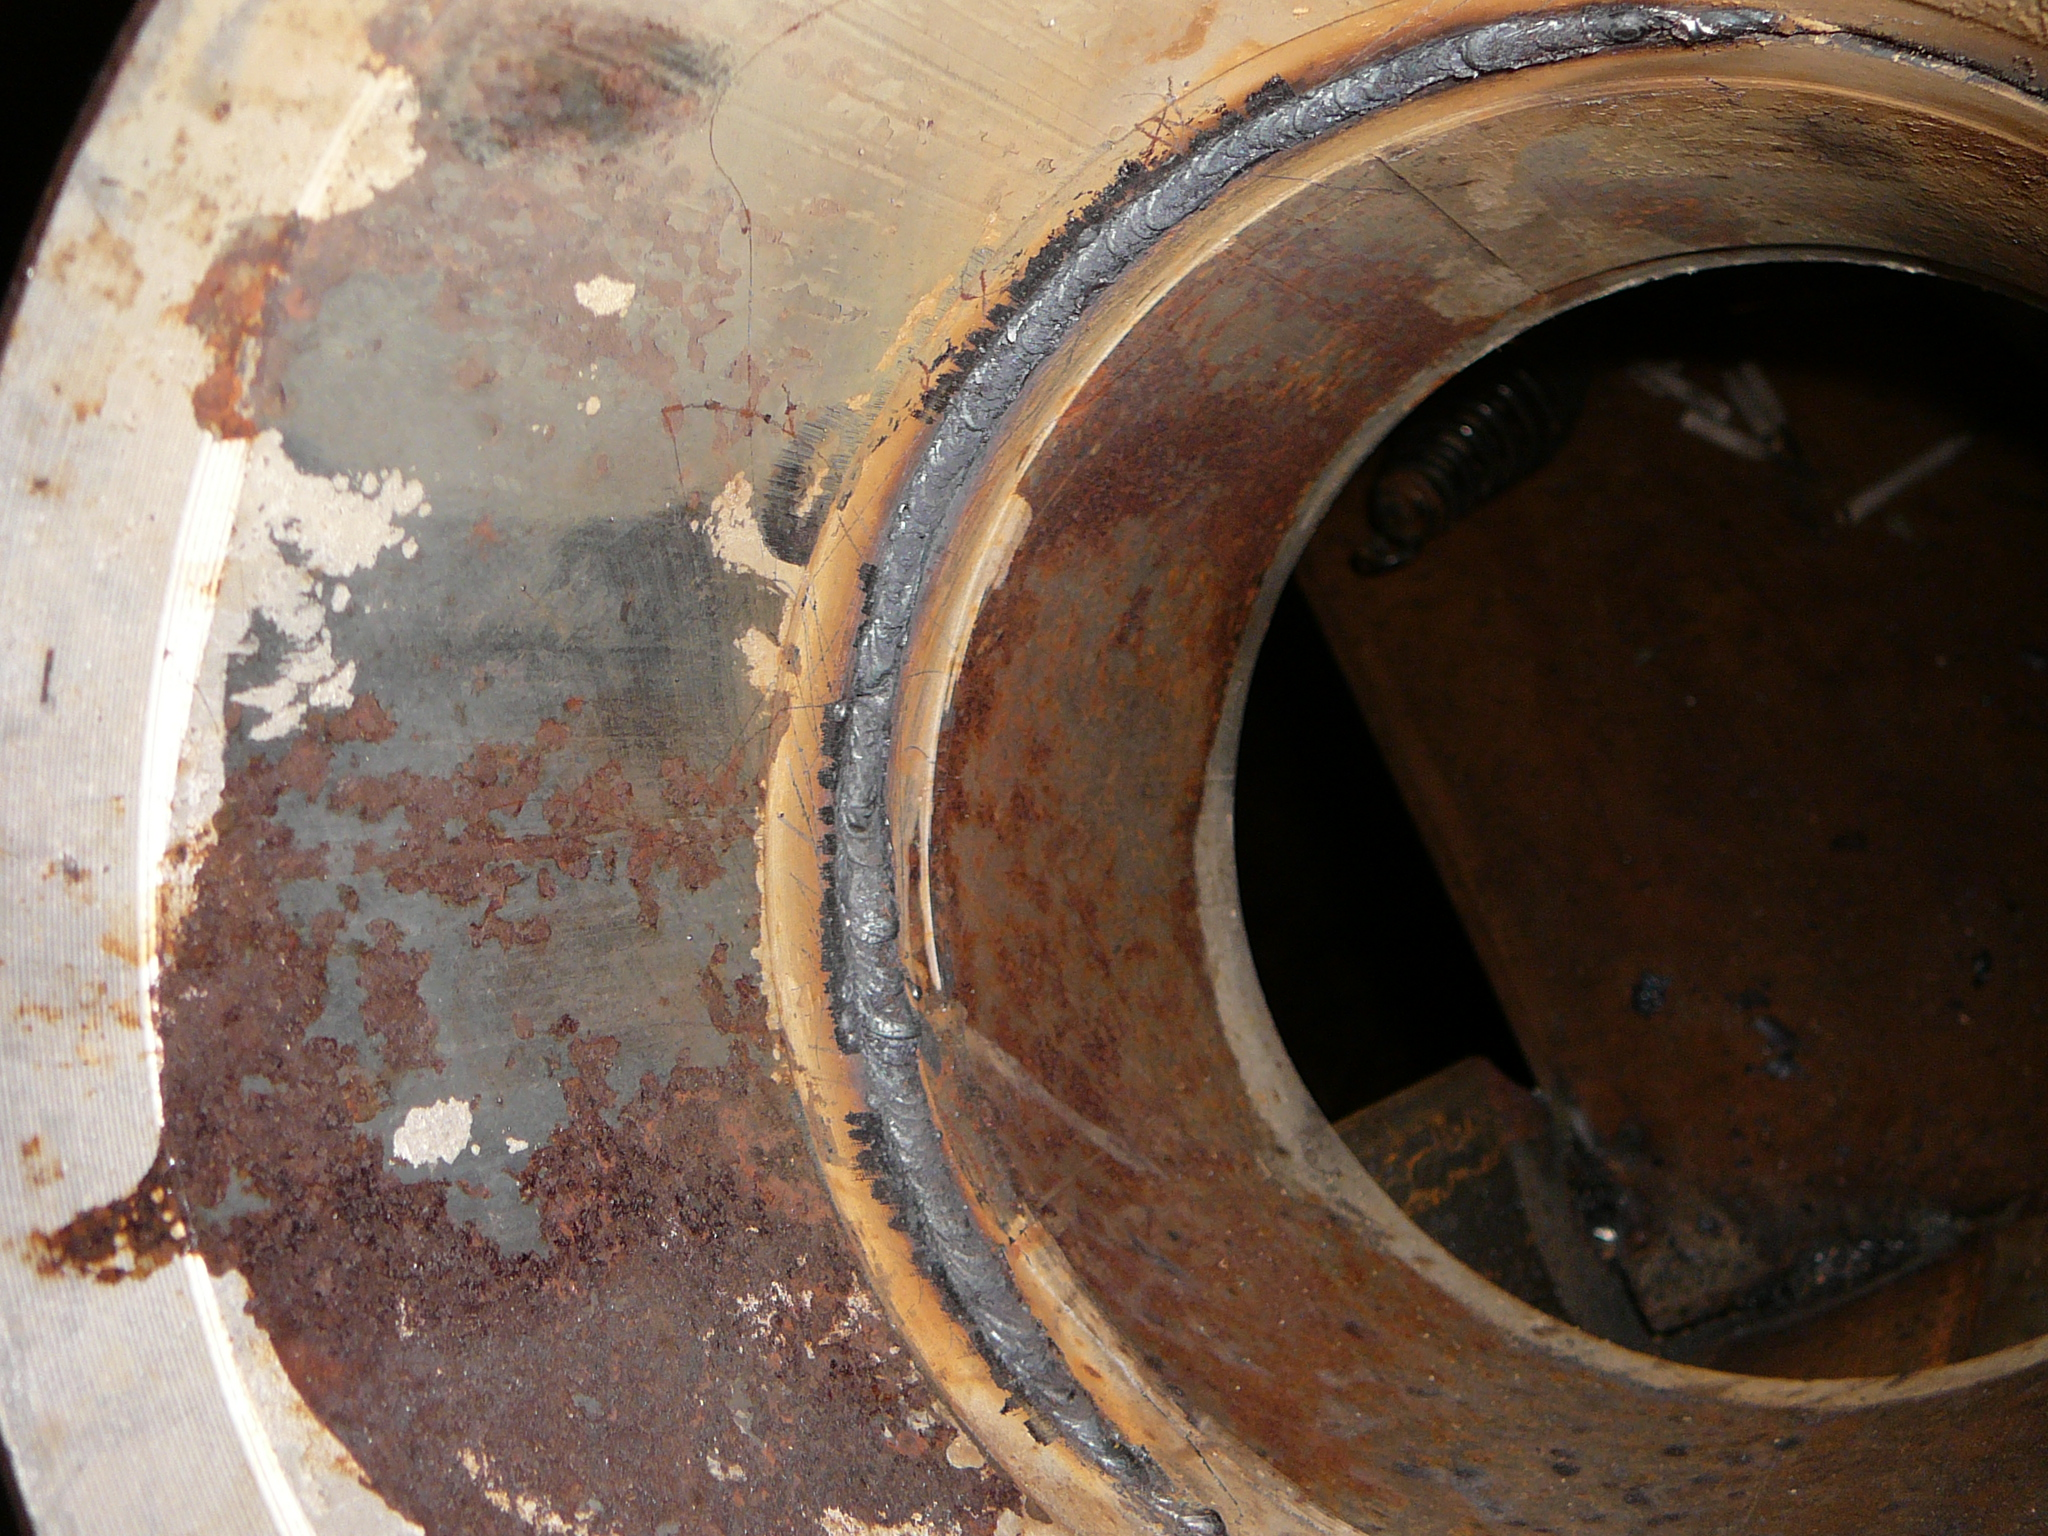 View of the root & Longevity 140 Amp Stick Welder